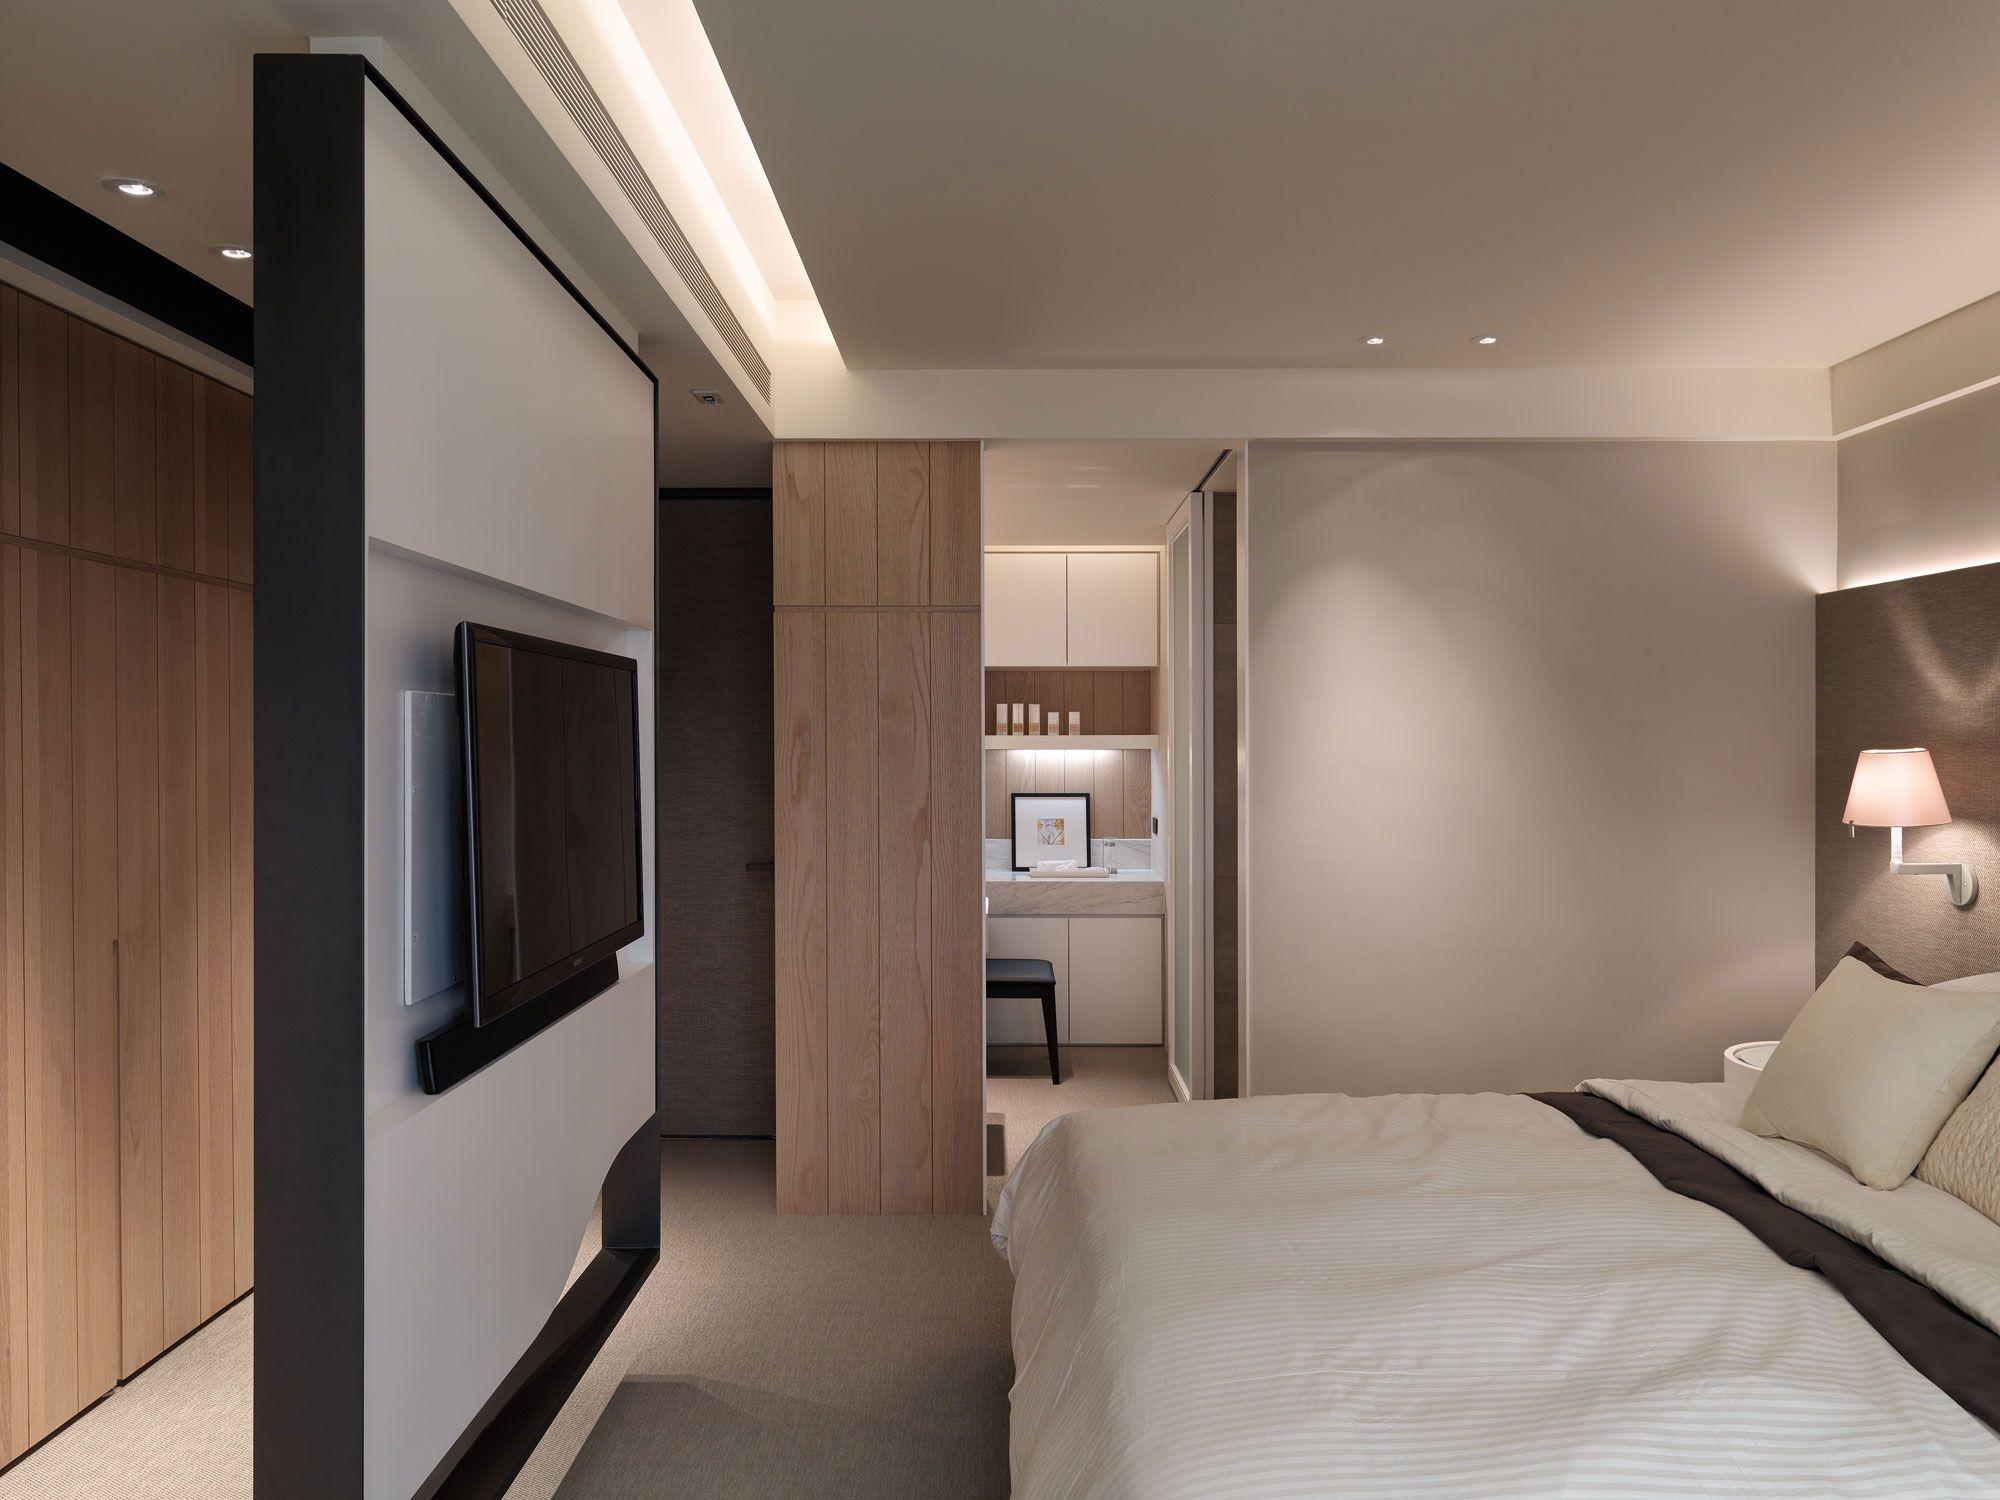 A-Multilevel-Contemporary-Apartment-20